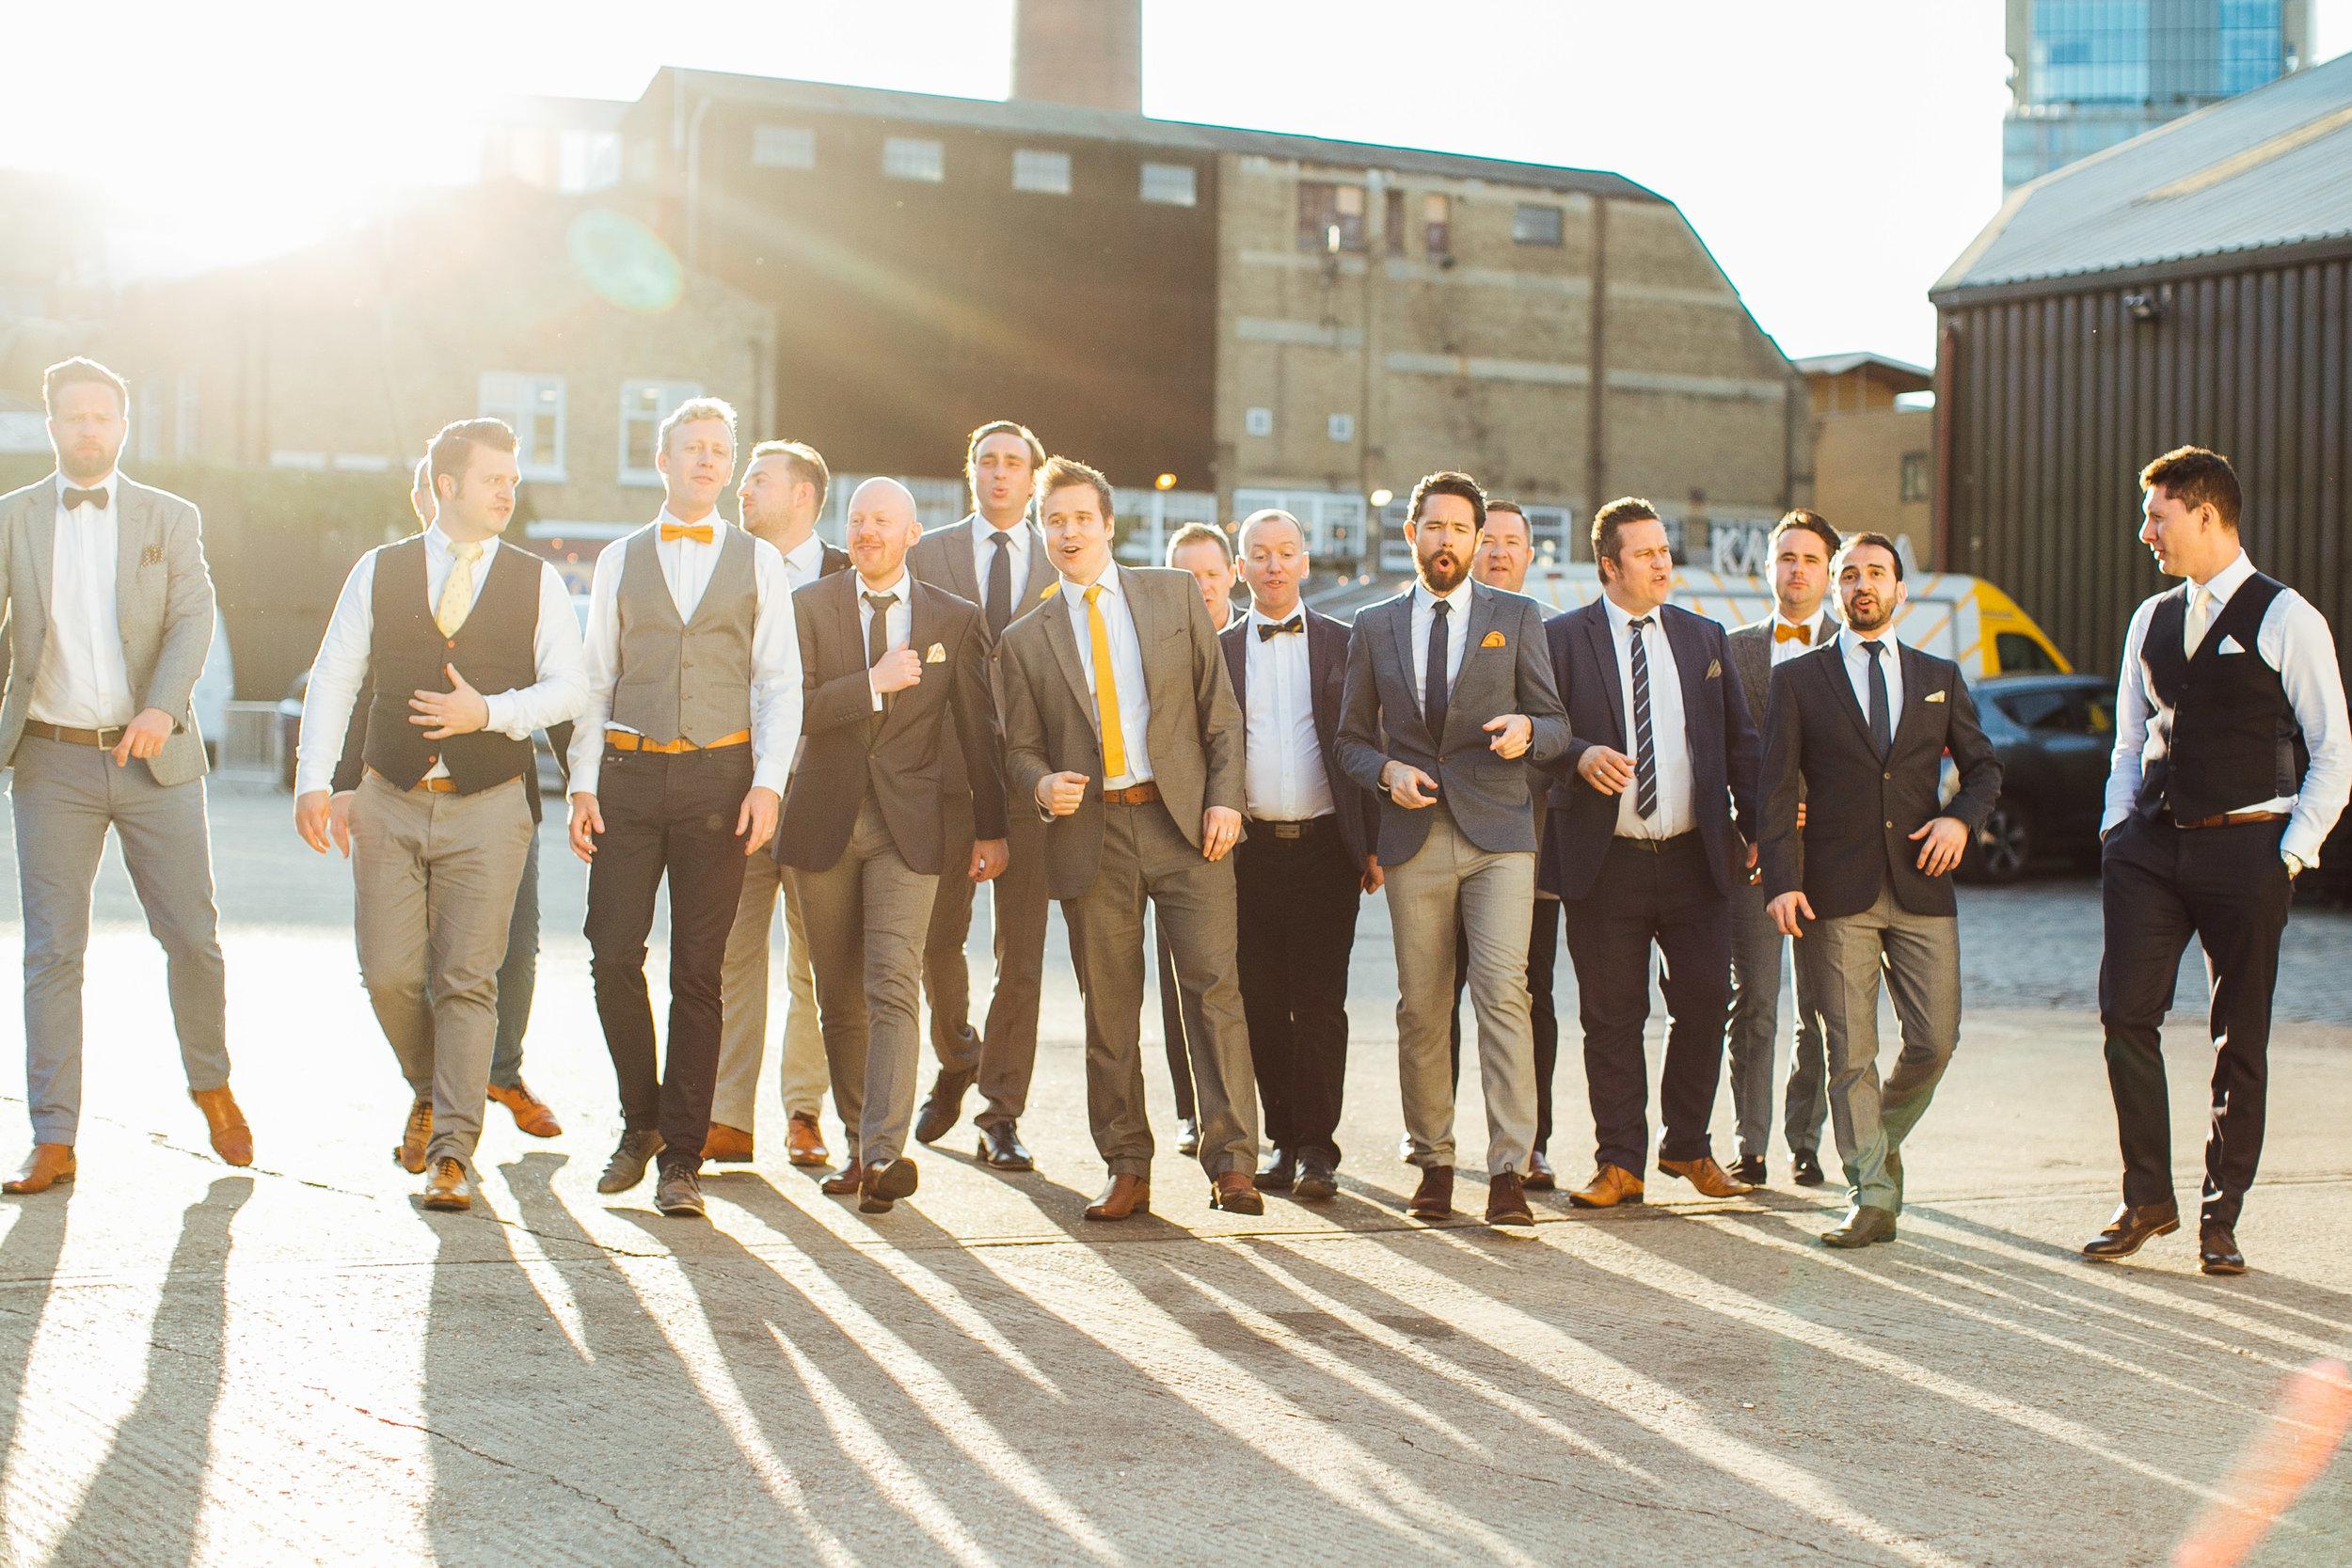 London Wedding Band The Buzztones